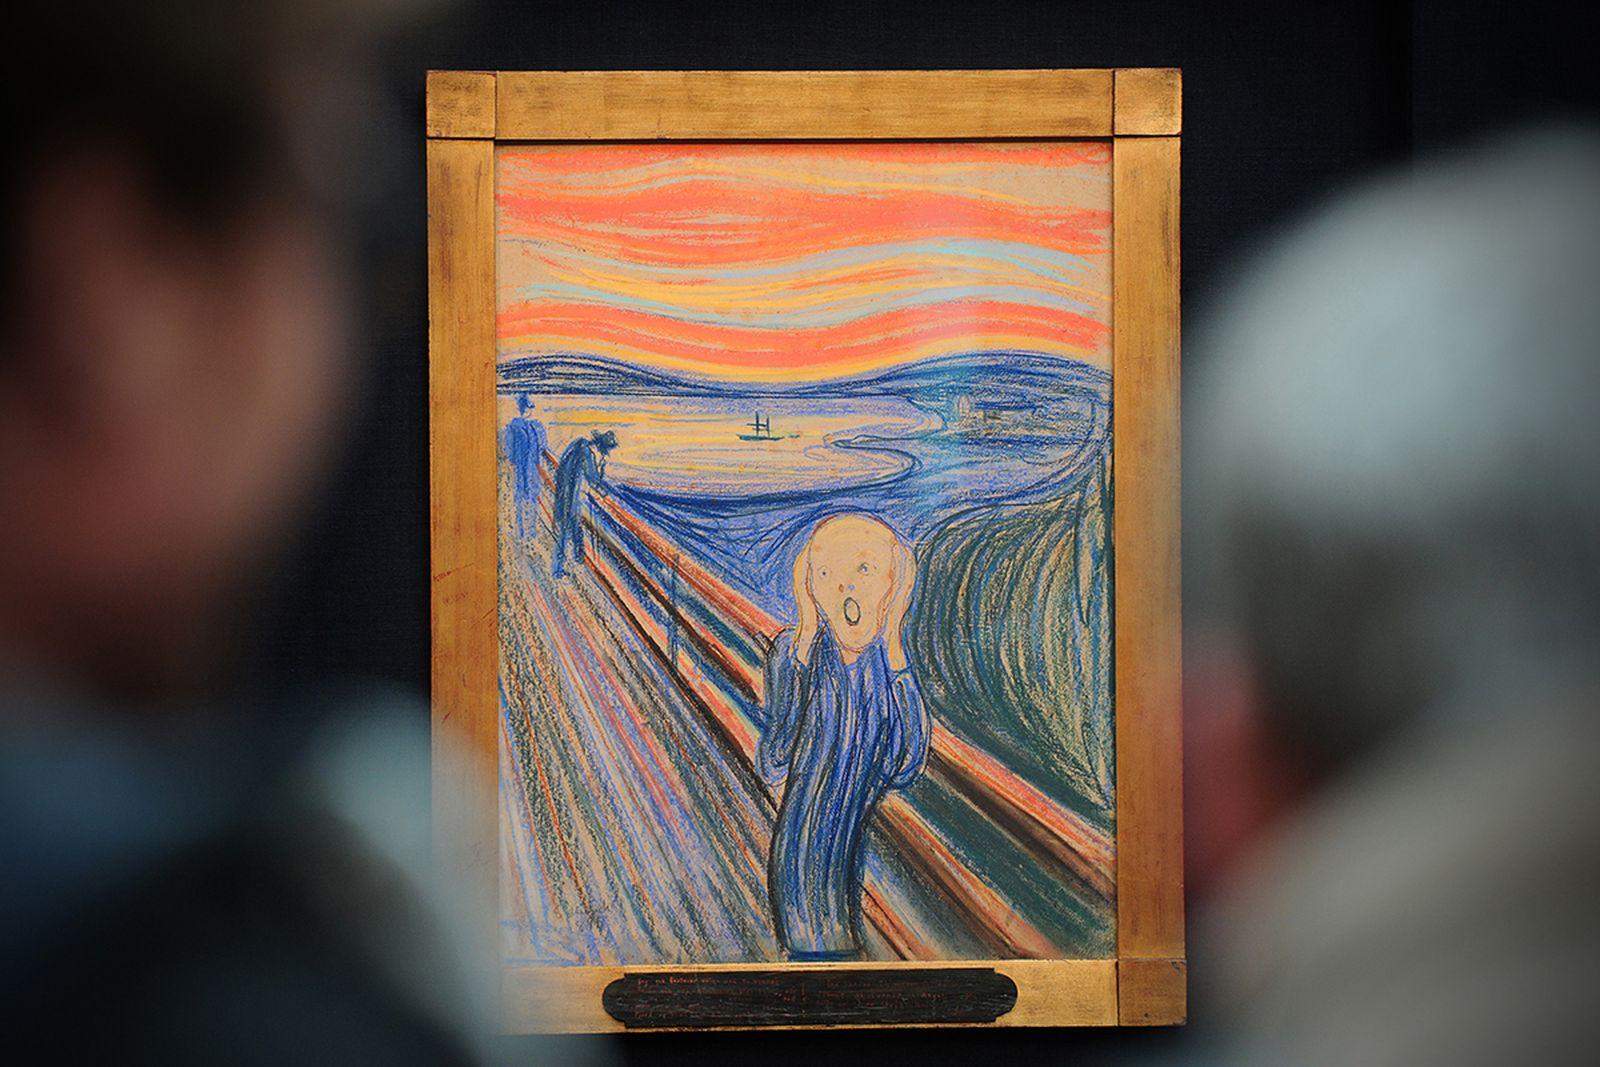 Edvard Munch 'The Scream'